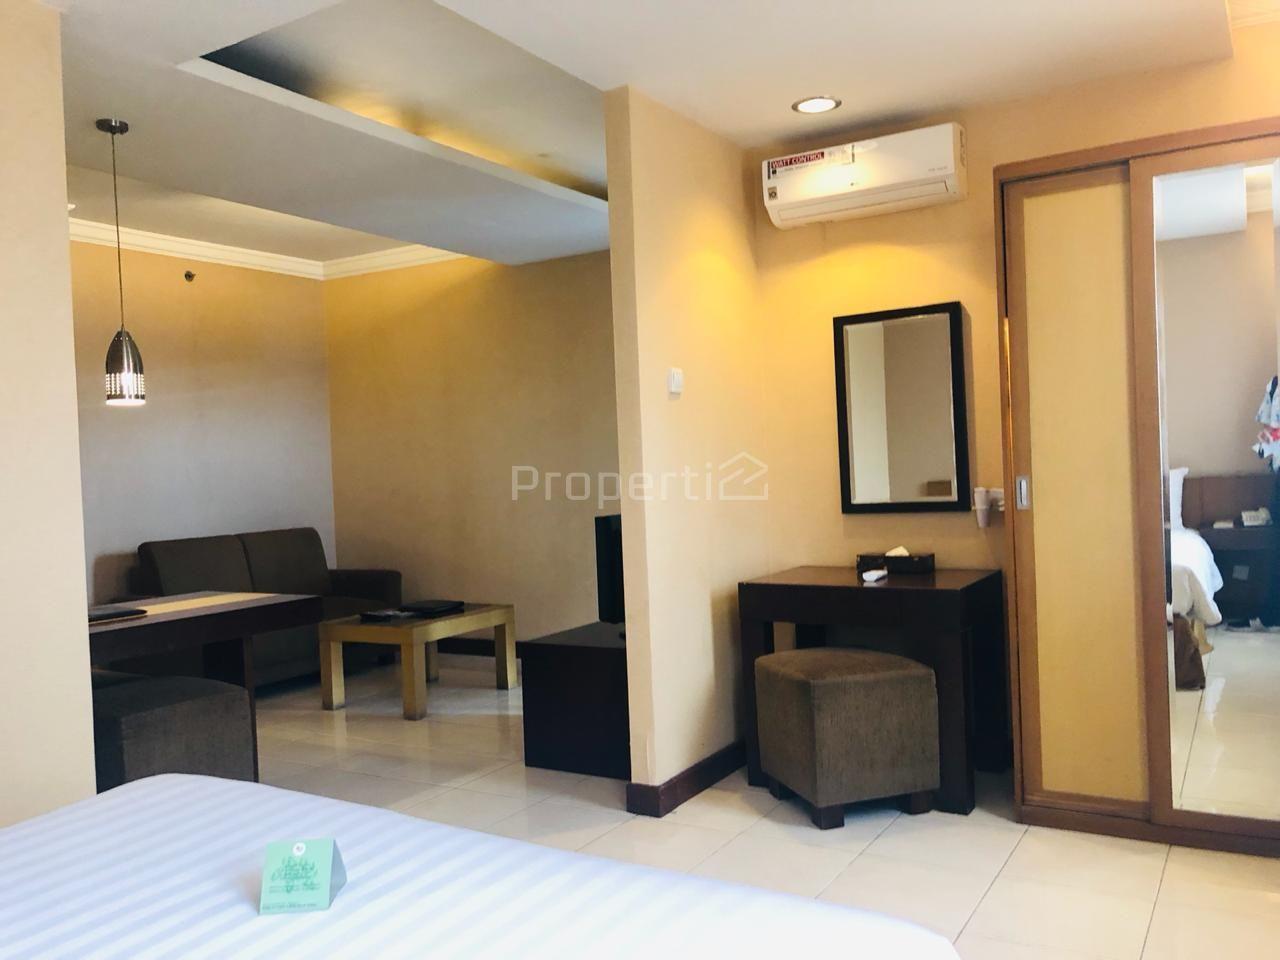 1BR Apartment Unit at The Majesty, 1st Floor, Jawa Barat